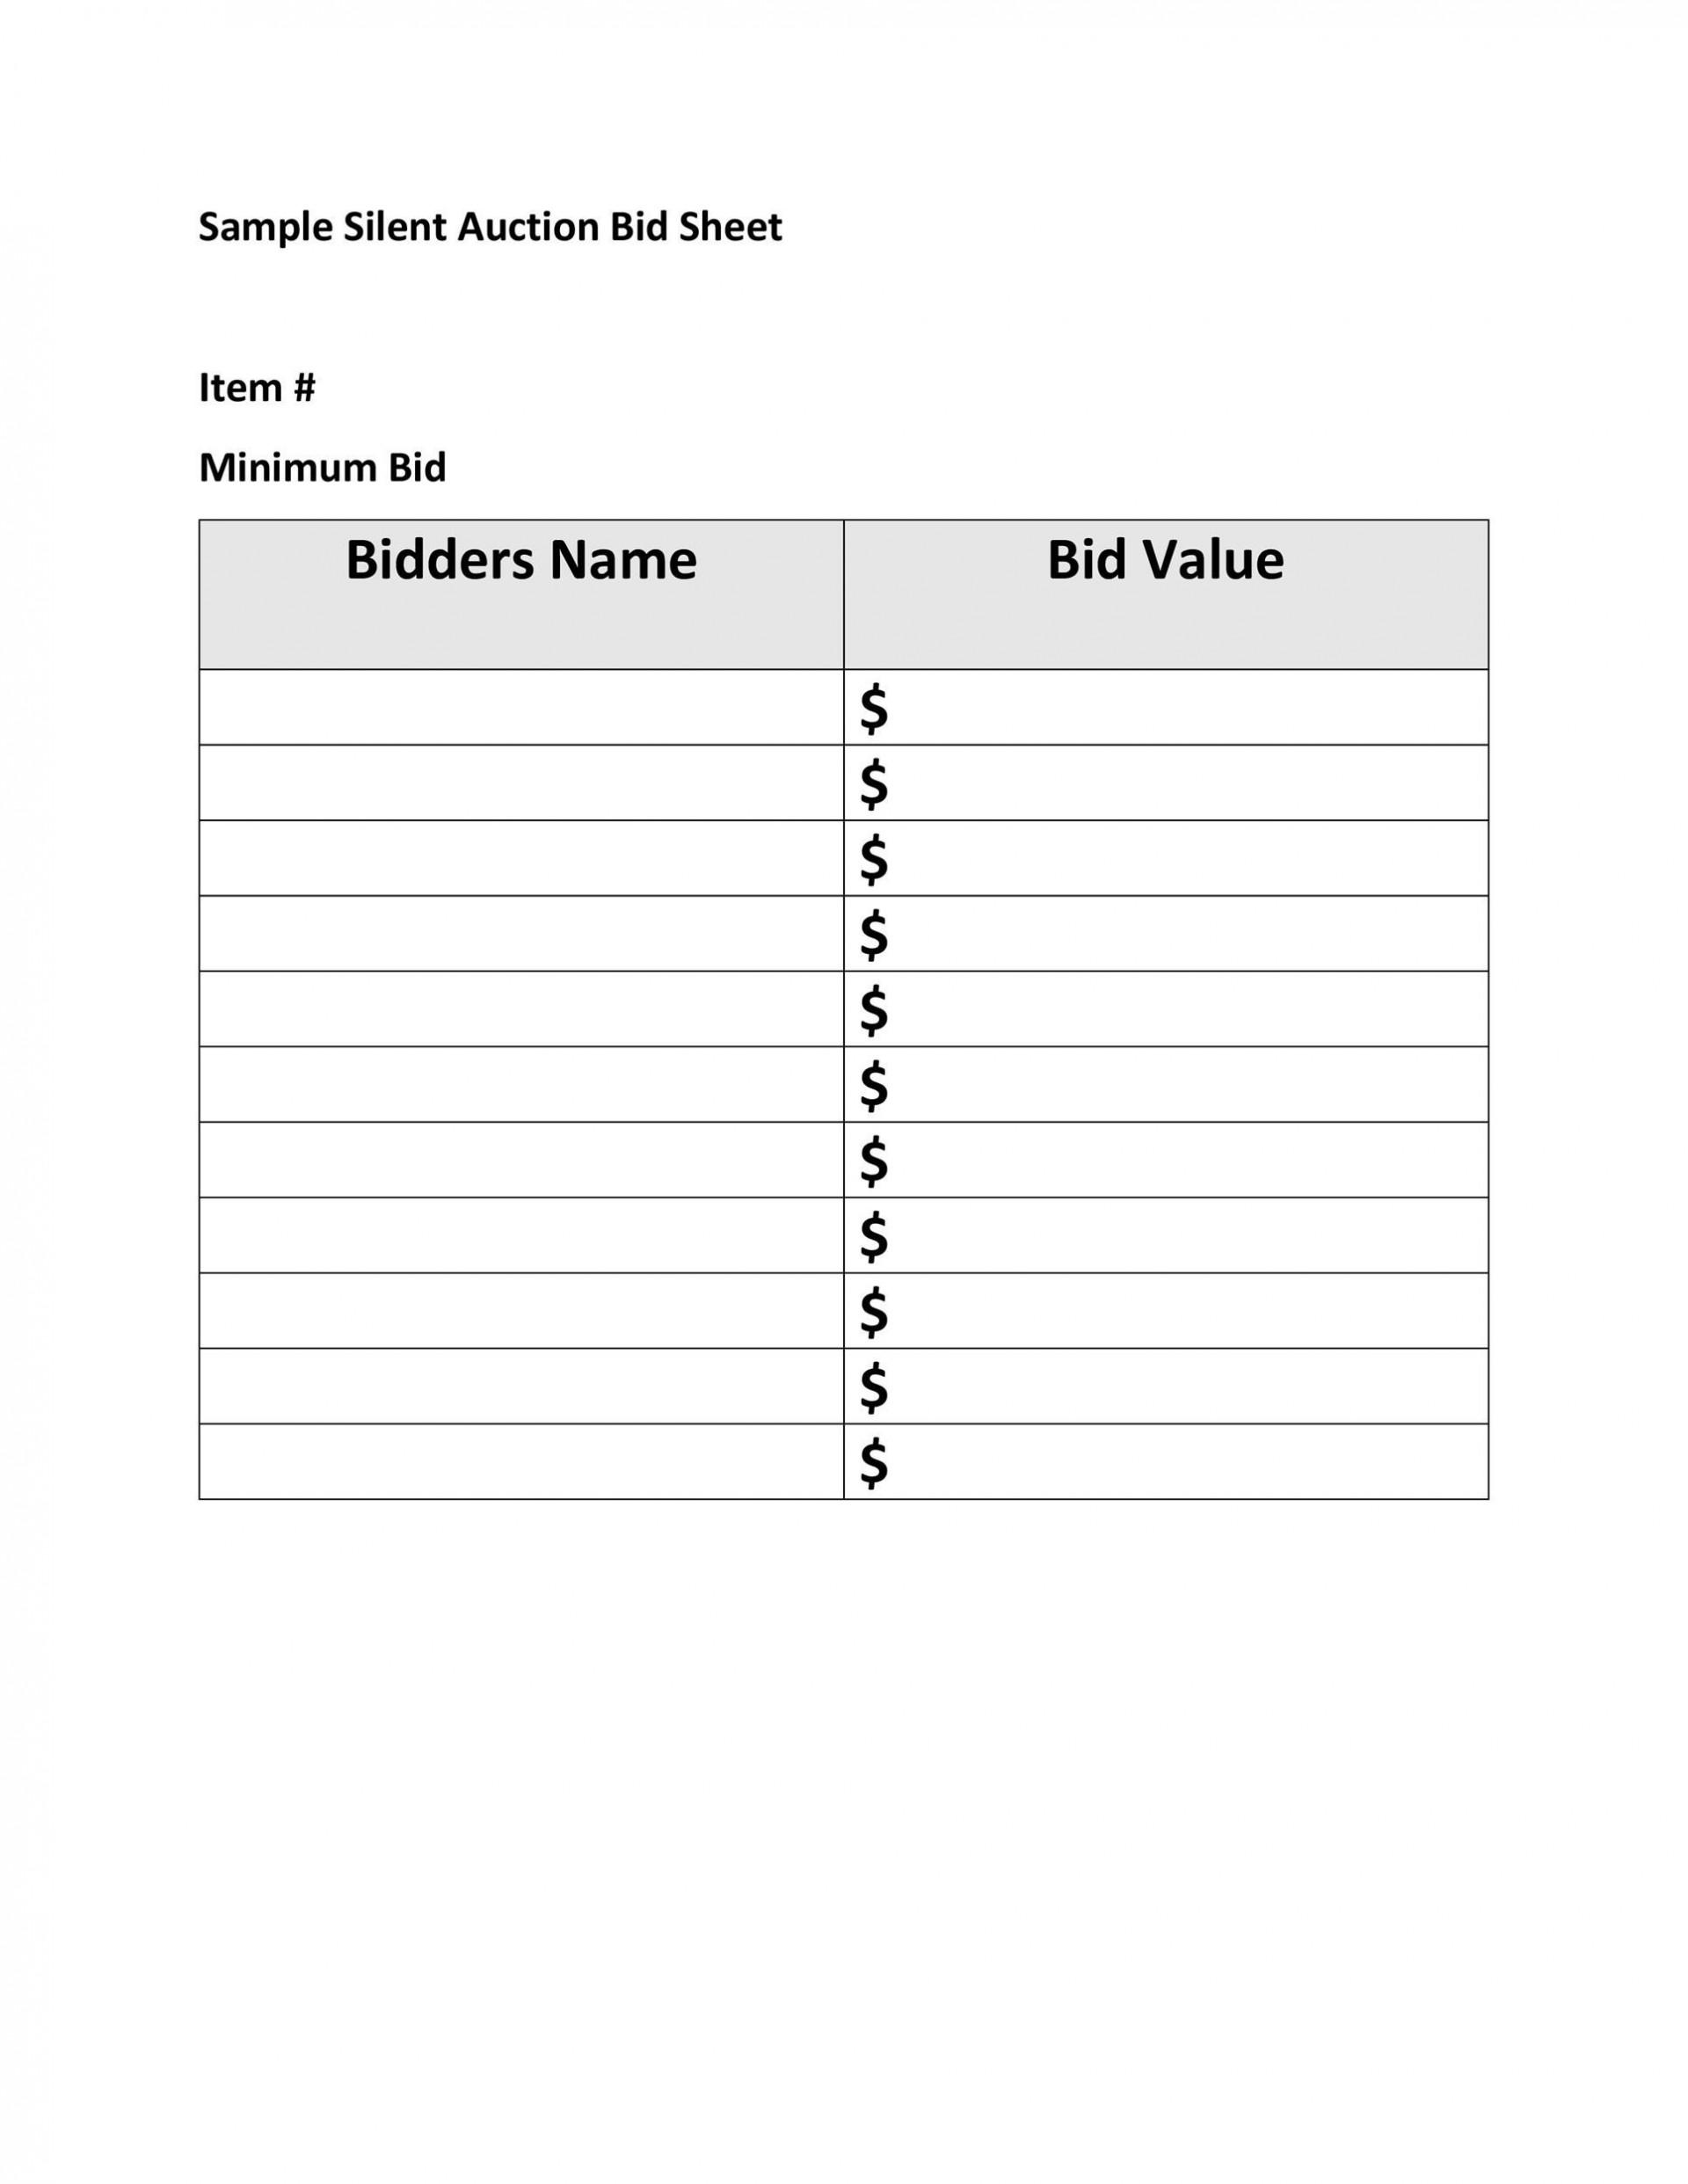 005 Unique Sample Silent Auction Bid Sheet Free  Printable Template Download1920